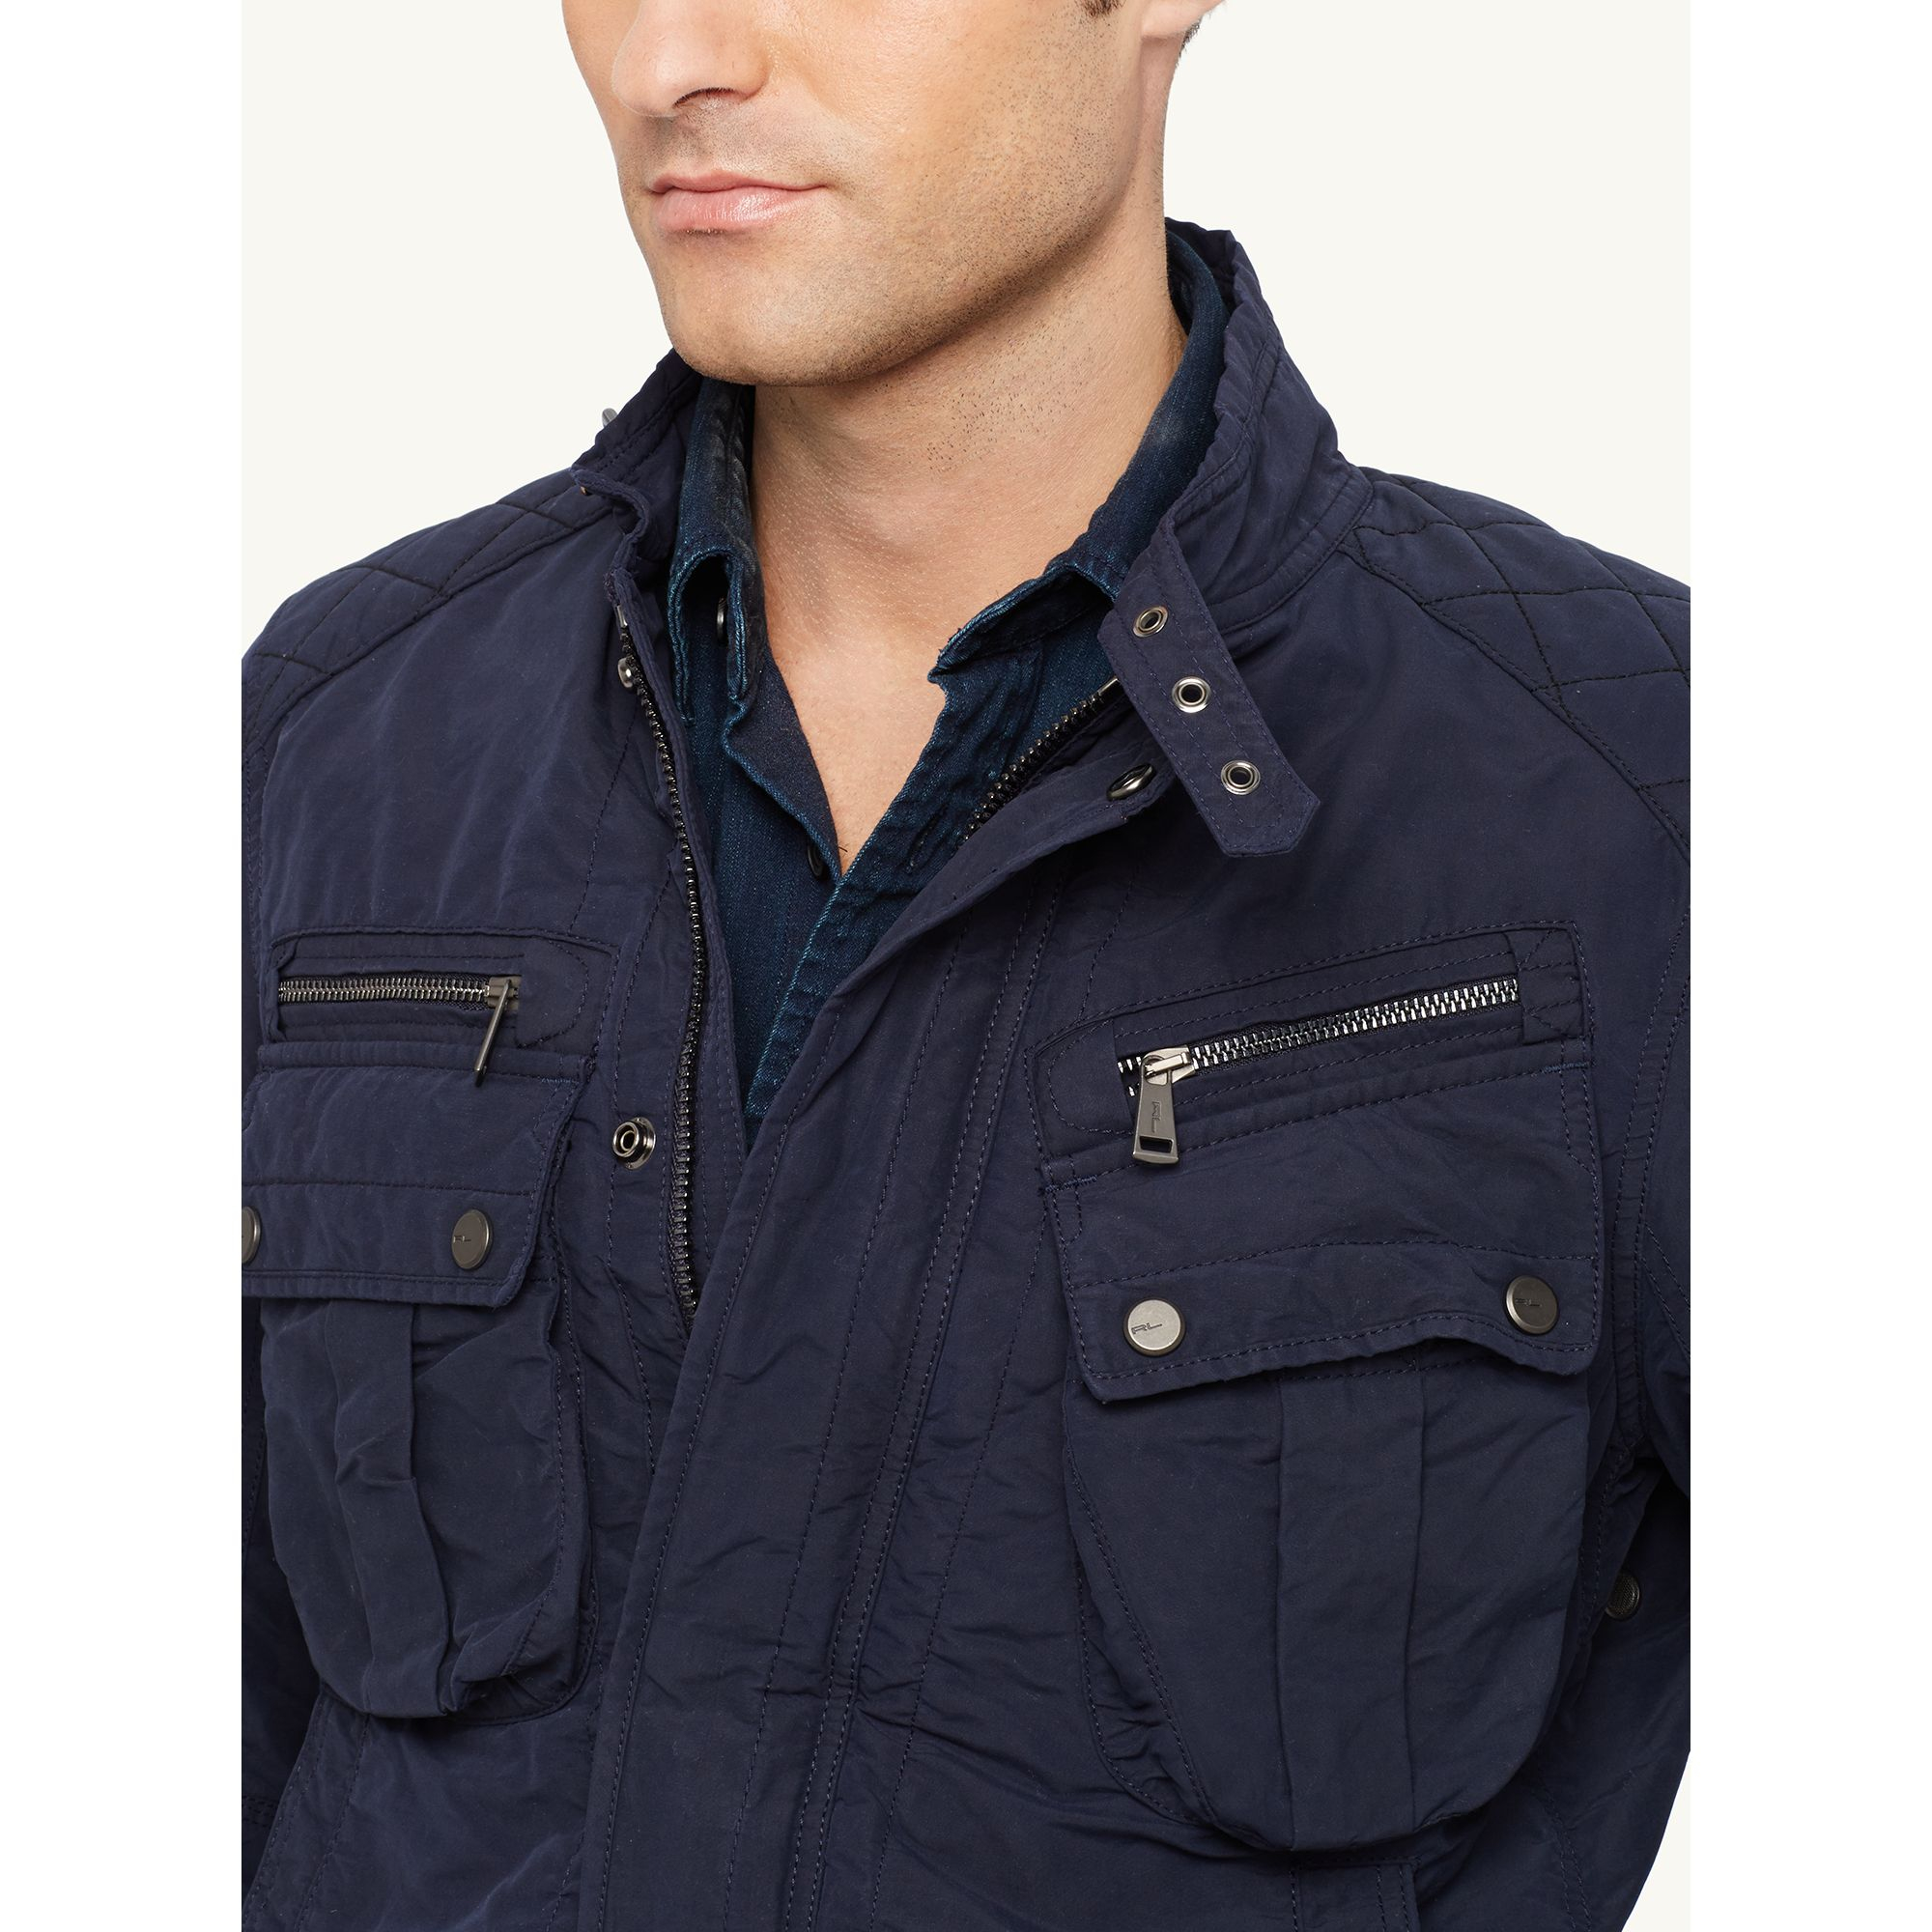 Ralph lauren black label Biker-bomber Jacket in Blue for Men | Lyst